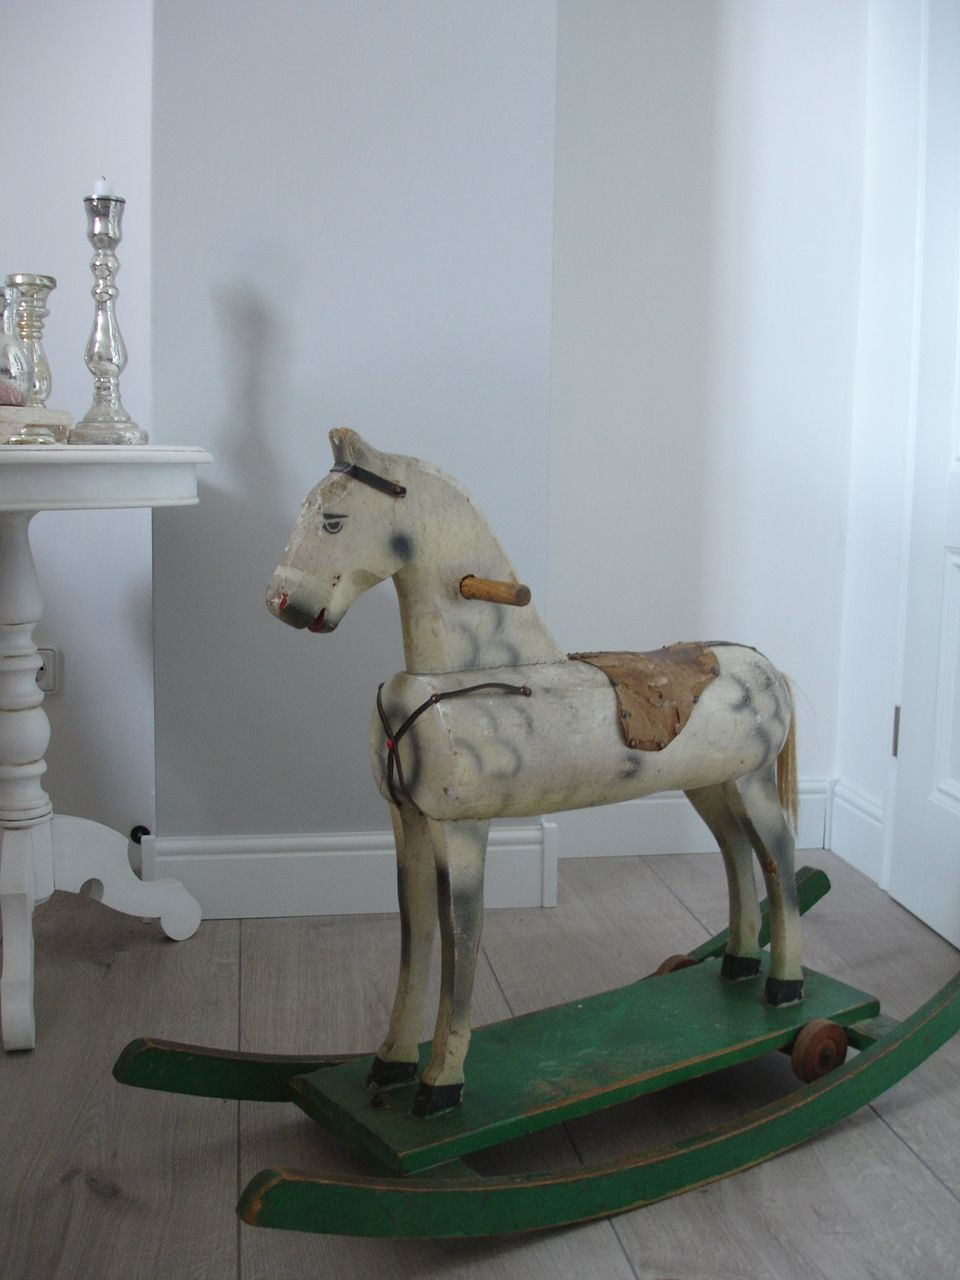 Pin Van Brocante Charmante Op Home Decorations Brocante Charmante Houten Paard Paarden Dieren